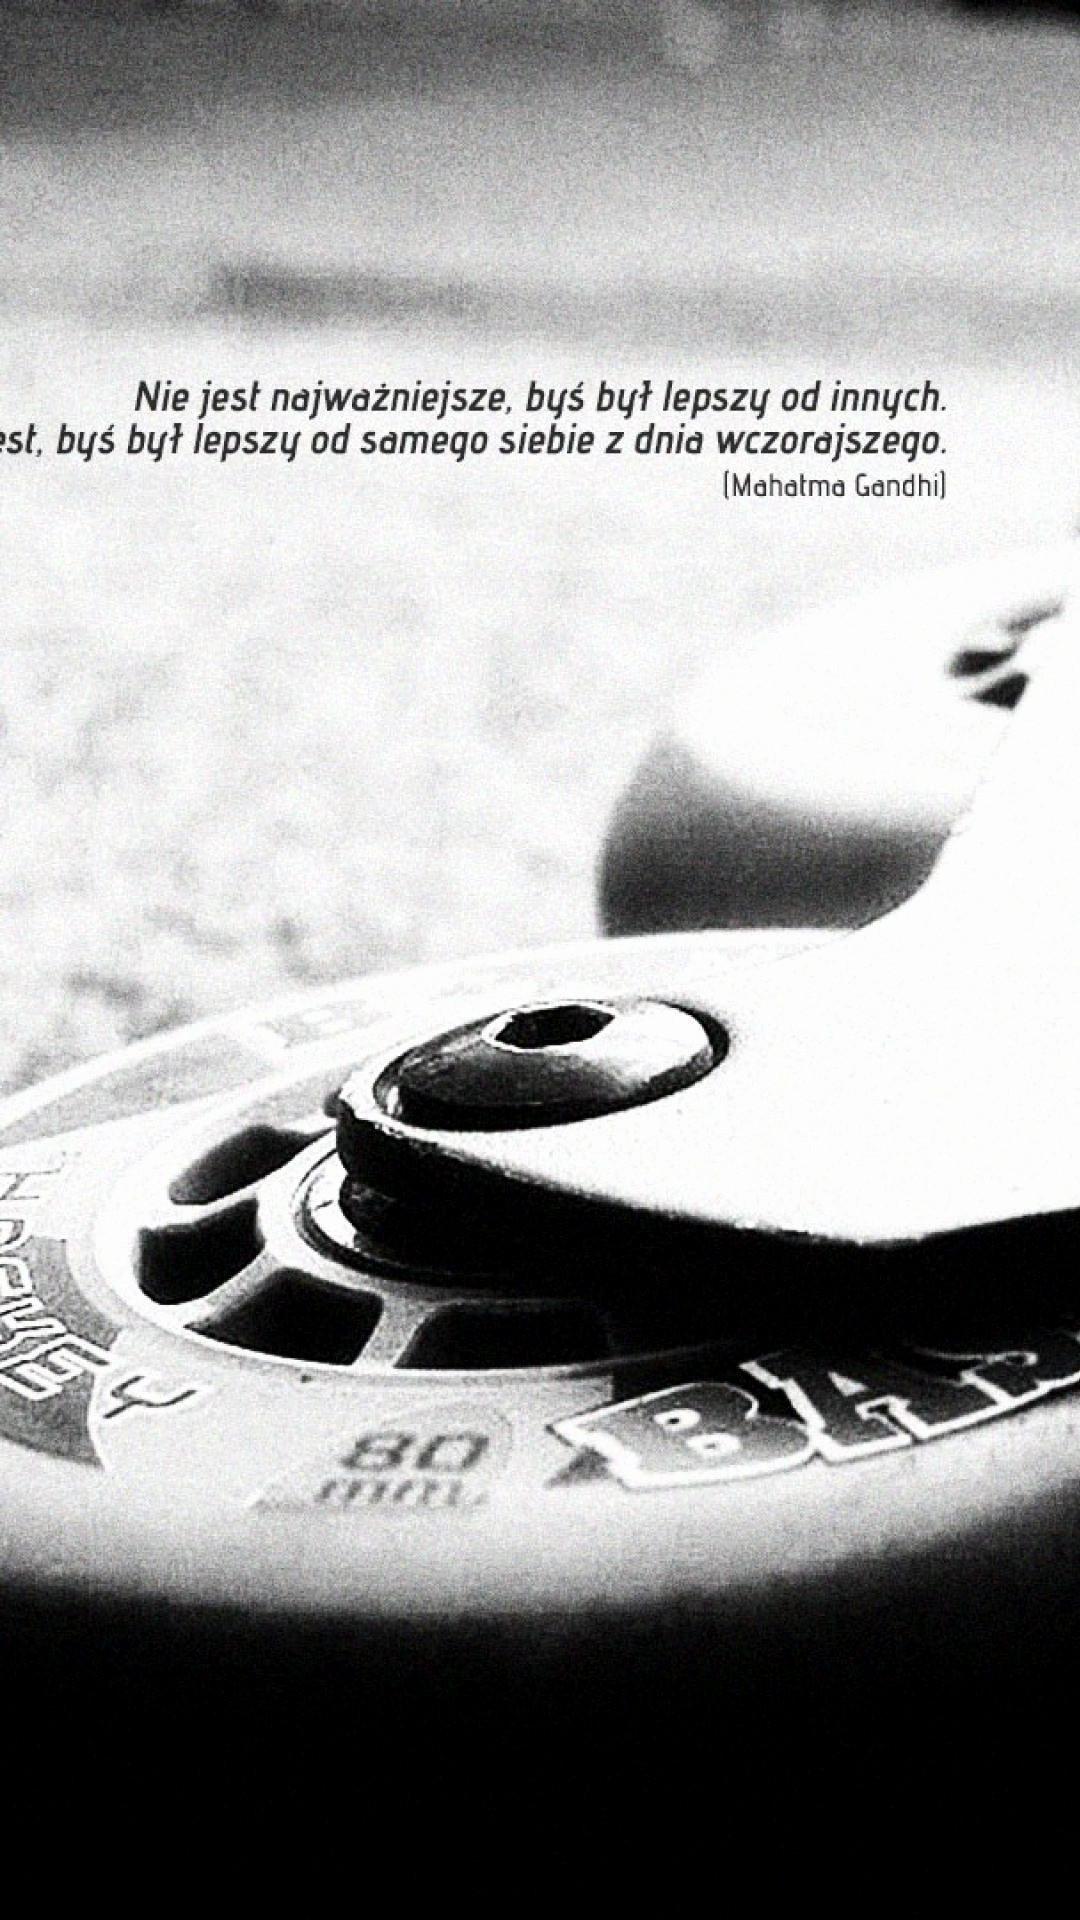 Res: 1080x1920, Cute Baby Panda iPhone Wallpaper Best Of iPhone Wallpapers Hd Part 454 Of  Cute Baby Panda